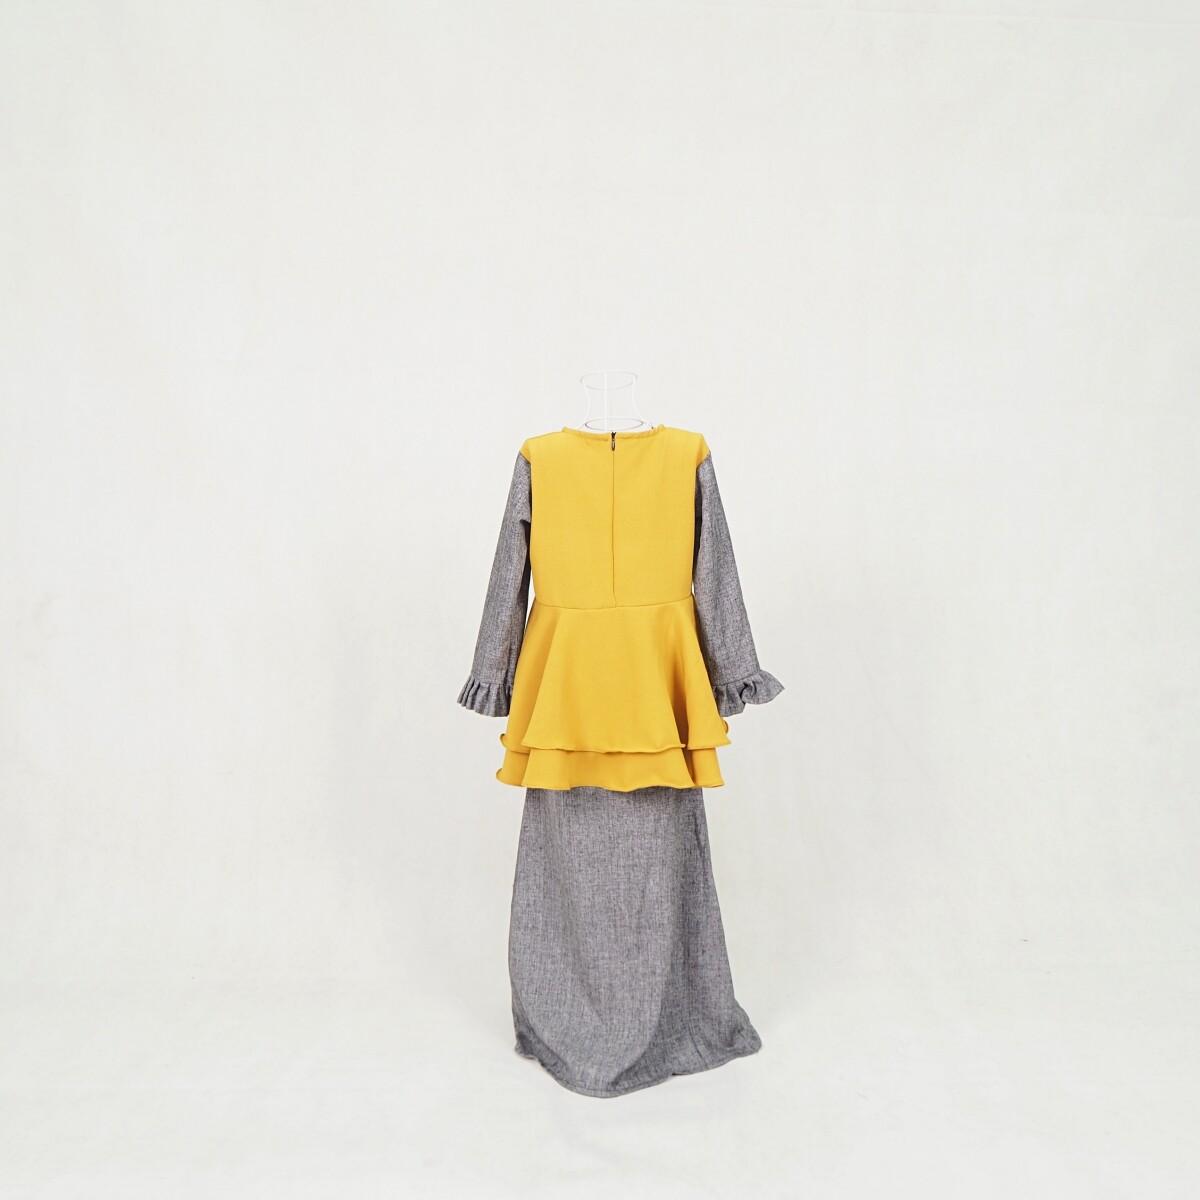 Muslim Kid Baju Kurung Kanak-Kanak Baju Raya Peplum Baju 2021 / Girls Dress / Merlene Baju Kurung Kid Girl Baby (7-12Years) / Ready Stock / Murah / Ship from Malaysia / Hot Product